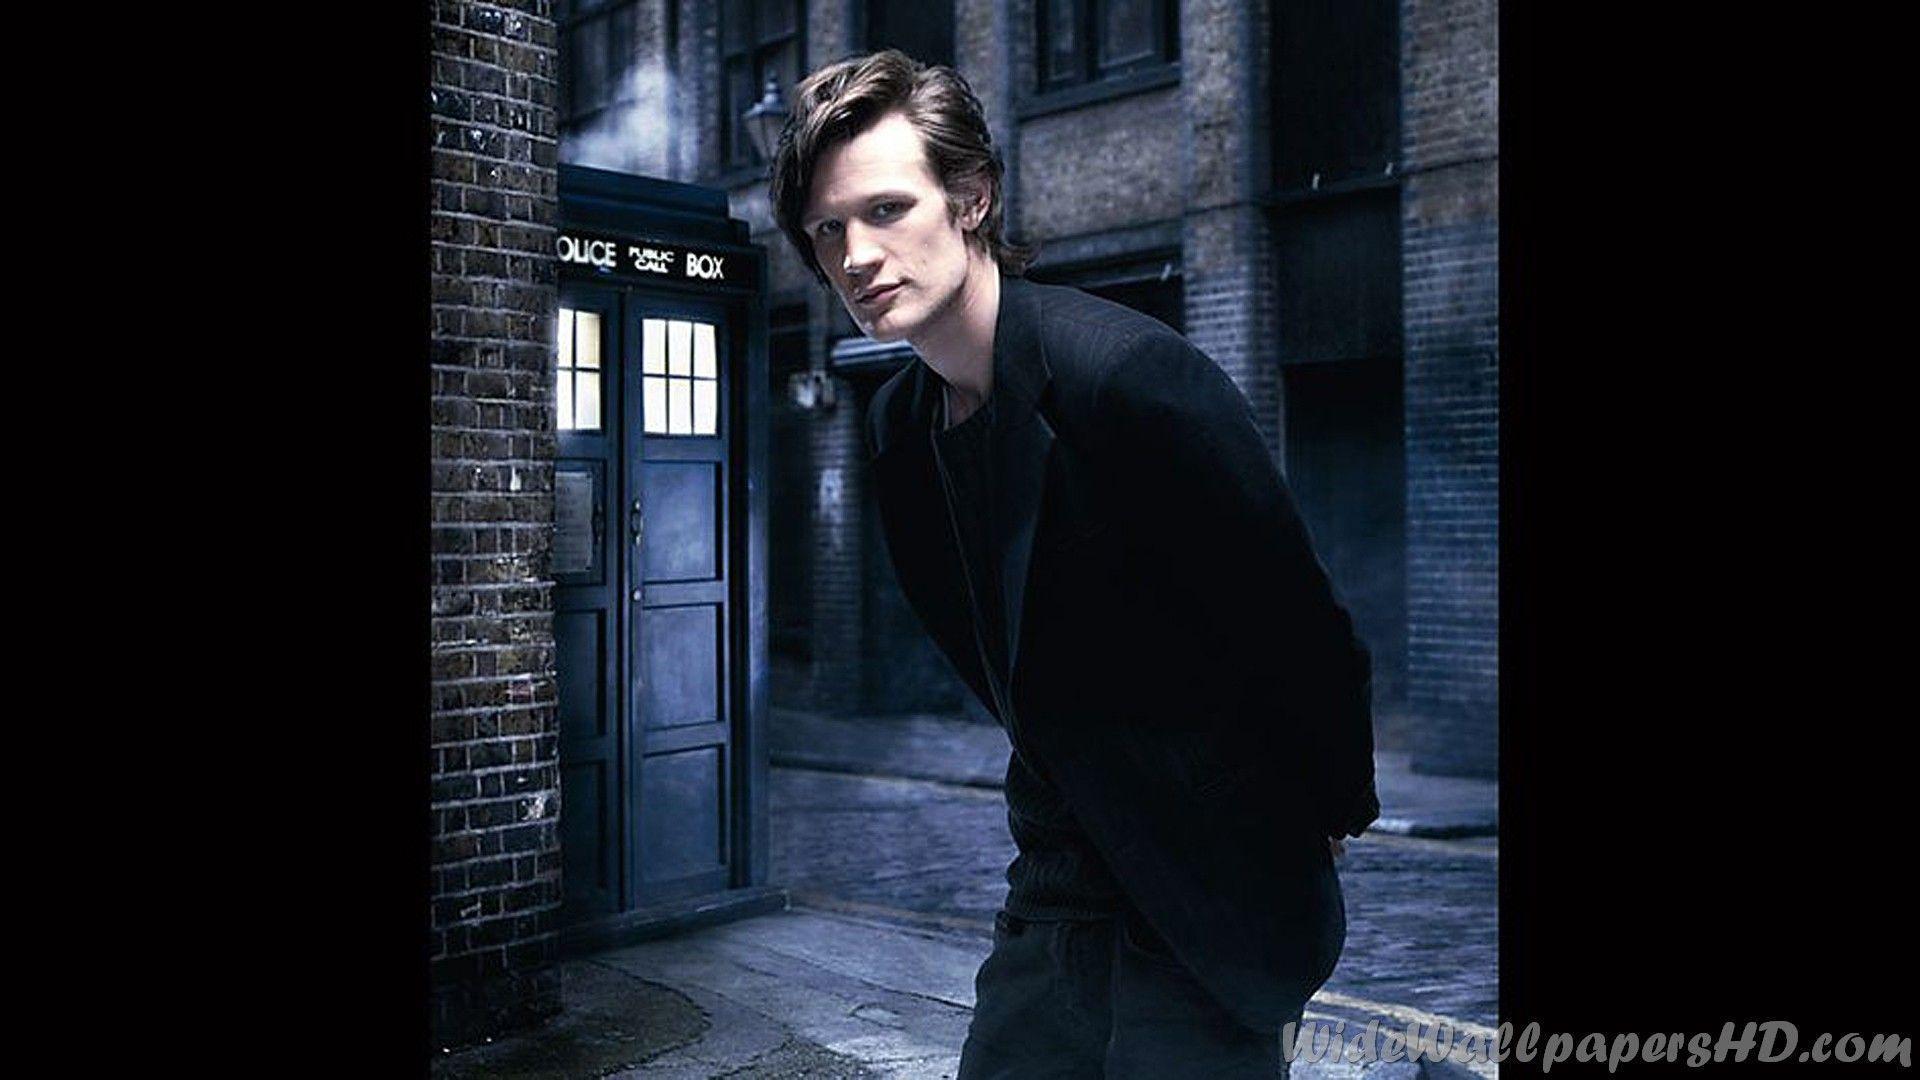 Doctor Who Matt Smith Wallpapers - Wallpaper Cave